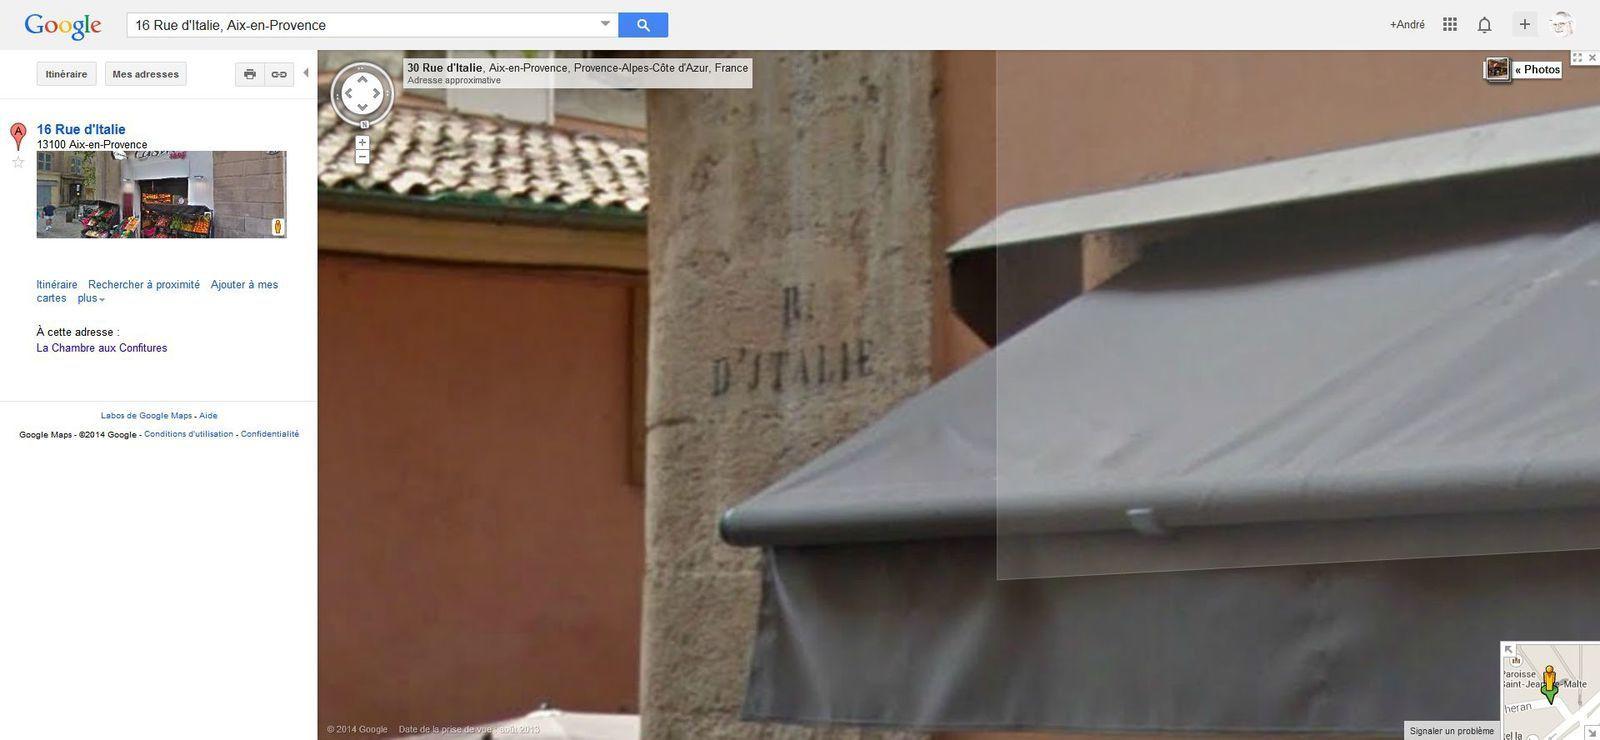 Rue d'Italie ou rue d'Jtalie ?